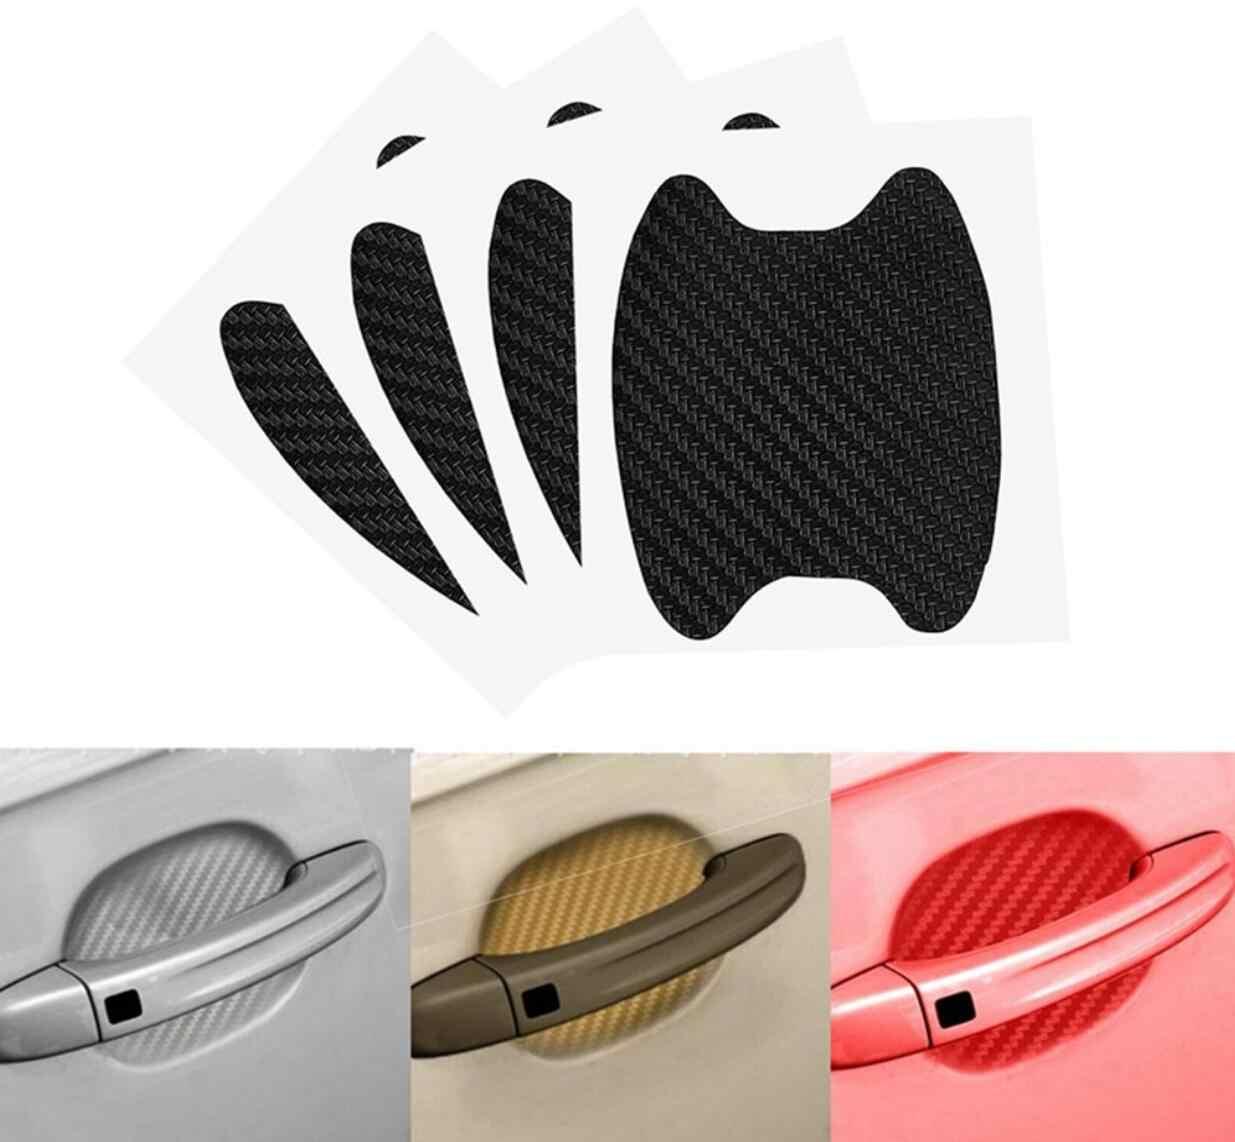 Porta do carro adesivo arranhões resistente capa para kia ceed rio sportage r k3 k4 k5 ceed sorento cerato optima